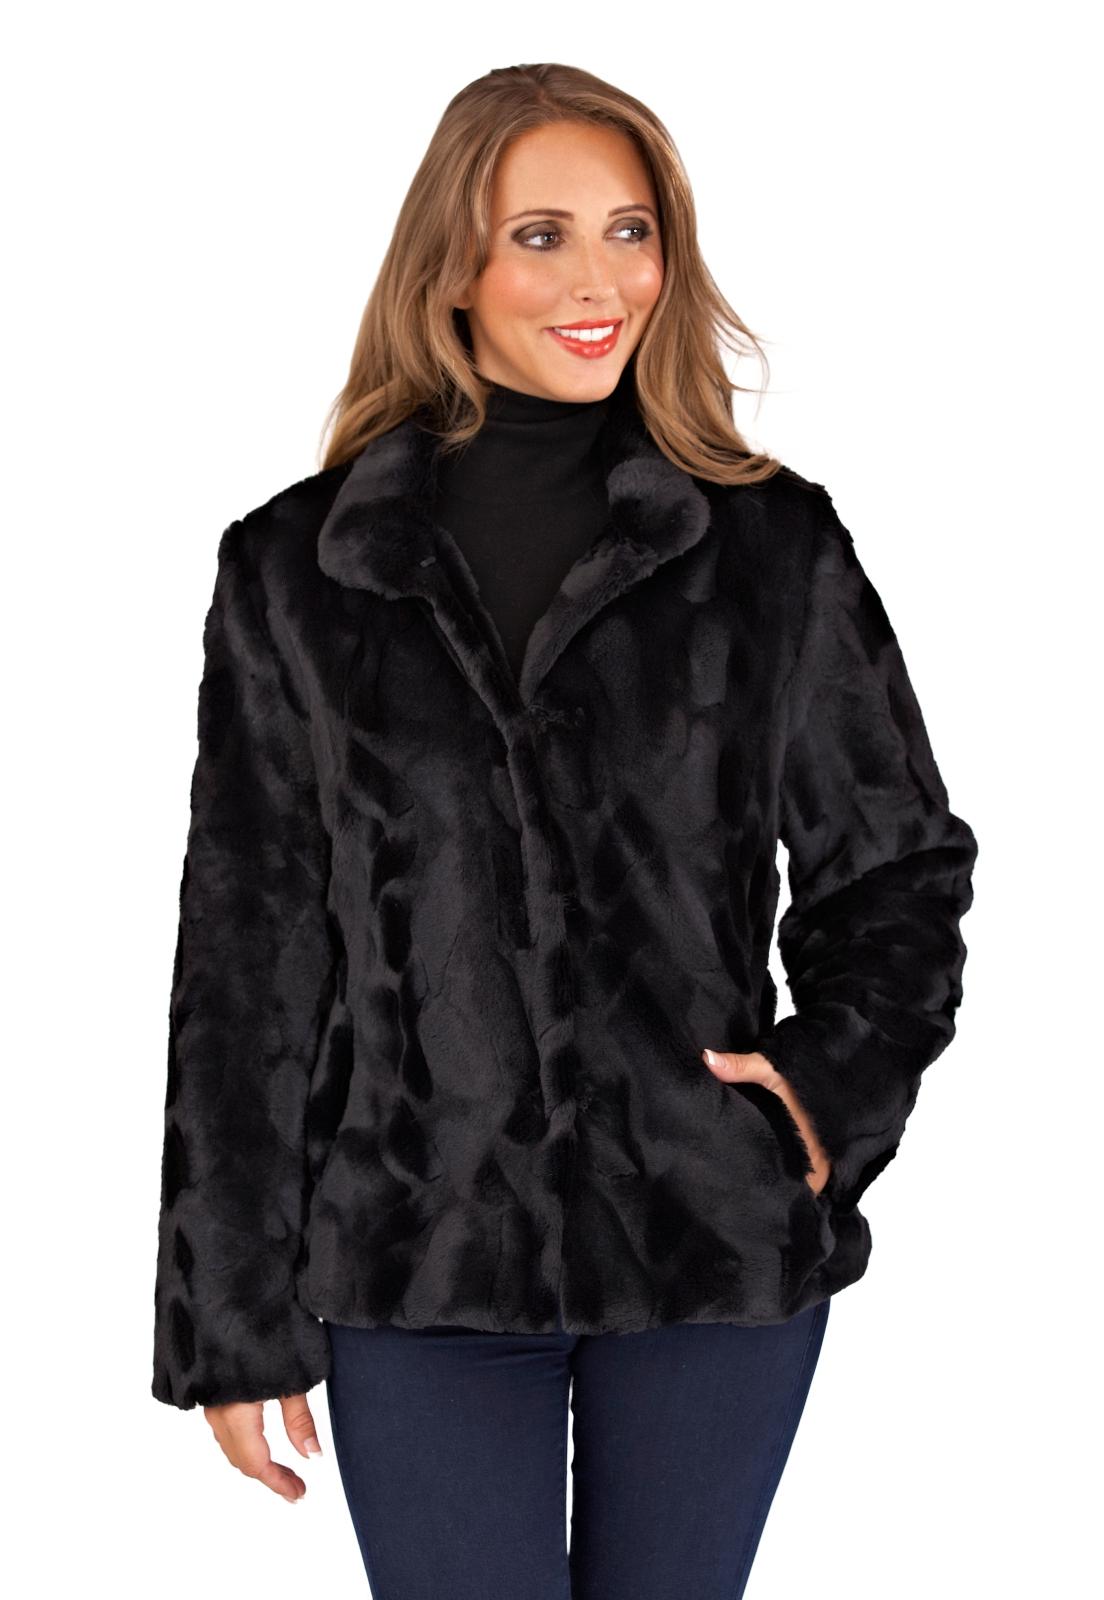 61d615e1892 Womens Faux Fur Coat Warm Winter Fluffy Jacket Evening Party Wrap ...